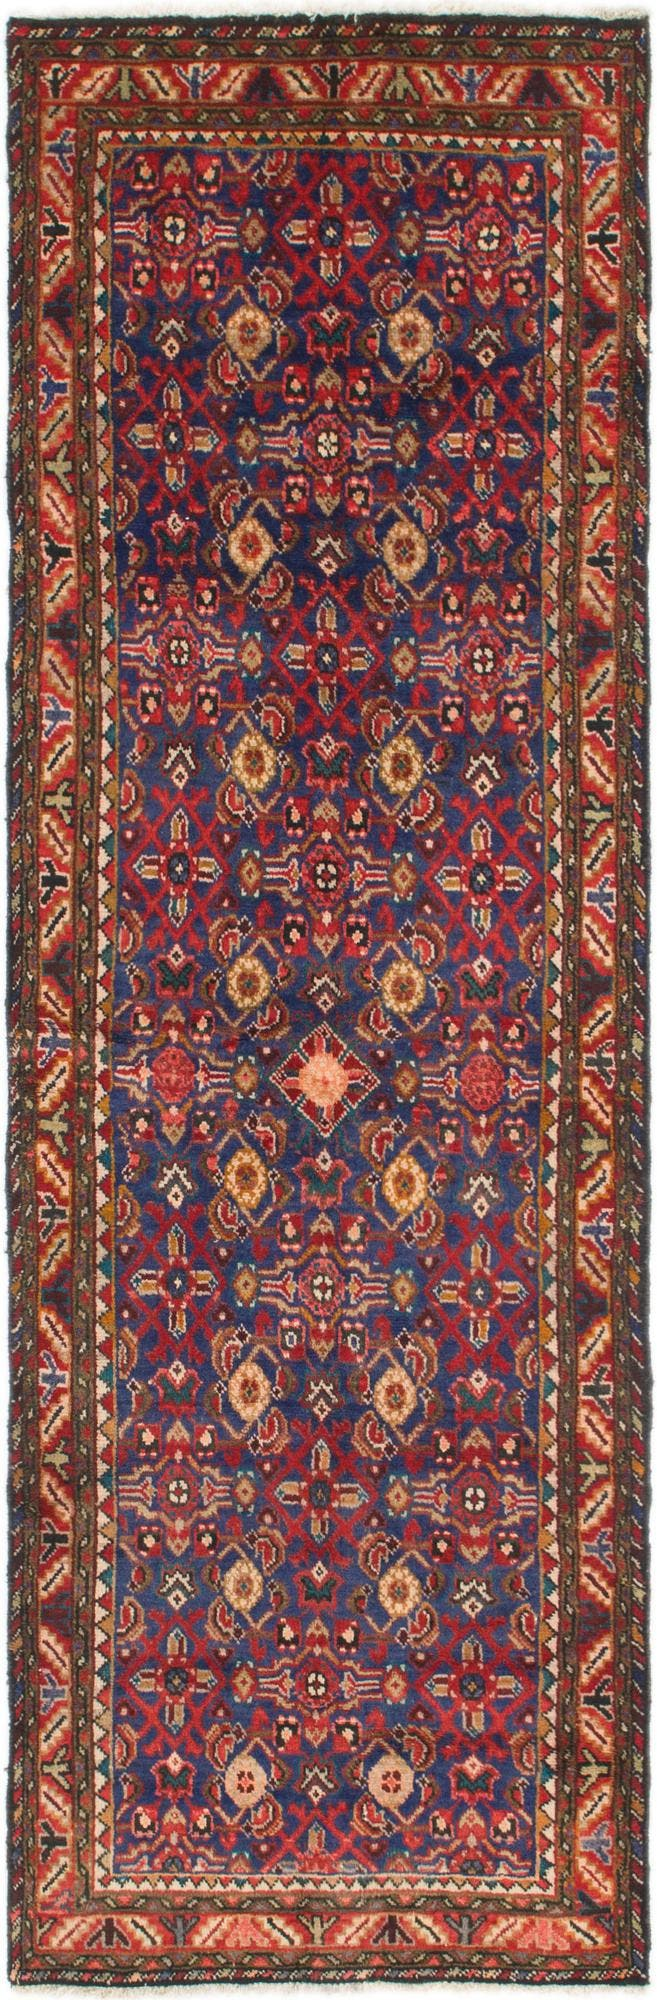 3' 3 x 9' 9 Malayer Persian Runner Rug main image